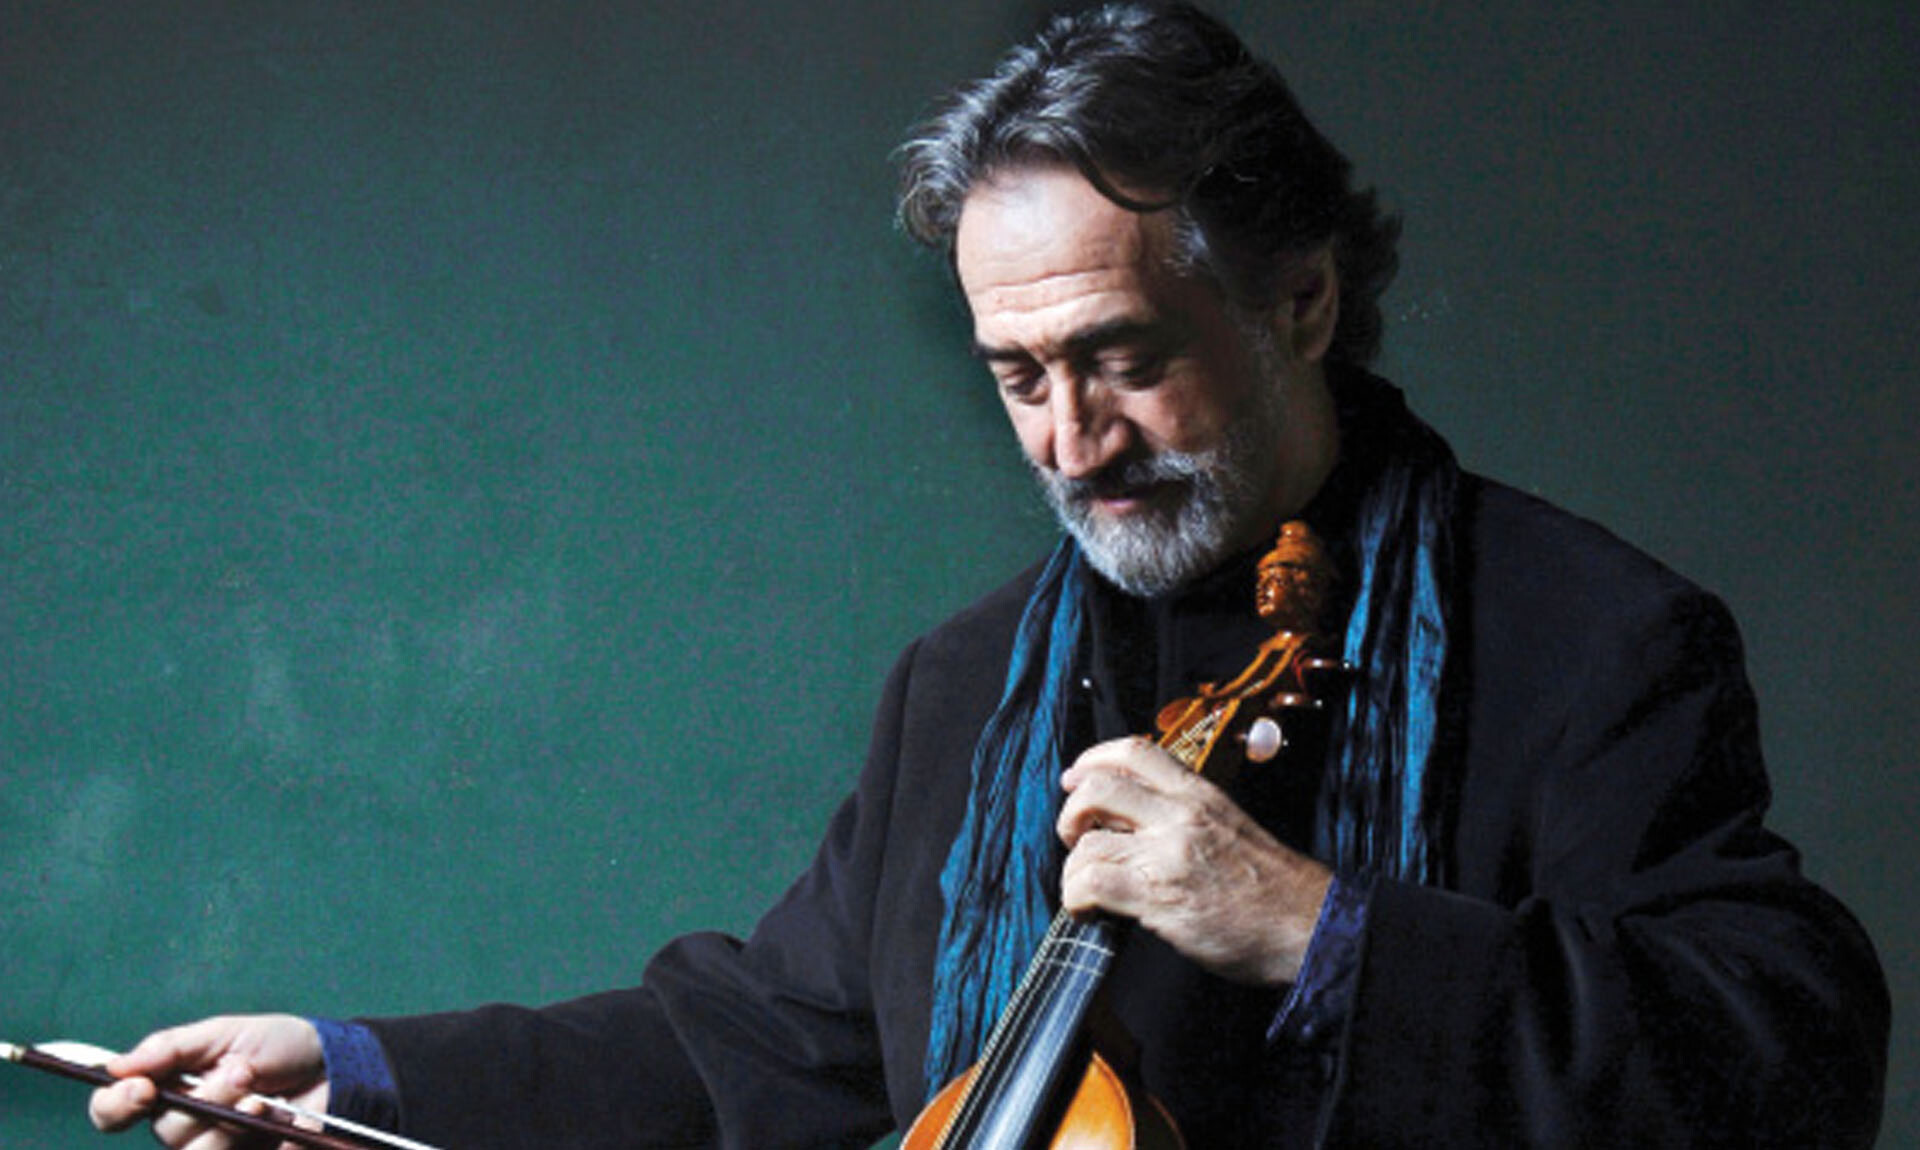 Stagione concertistica 2020 del Teatro Regio: JORDI SAVALL ROLF LISLEVAND ANDREW LAWRENCE-KING